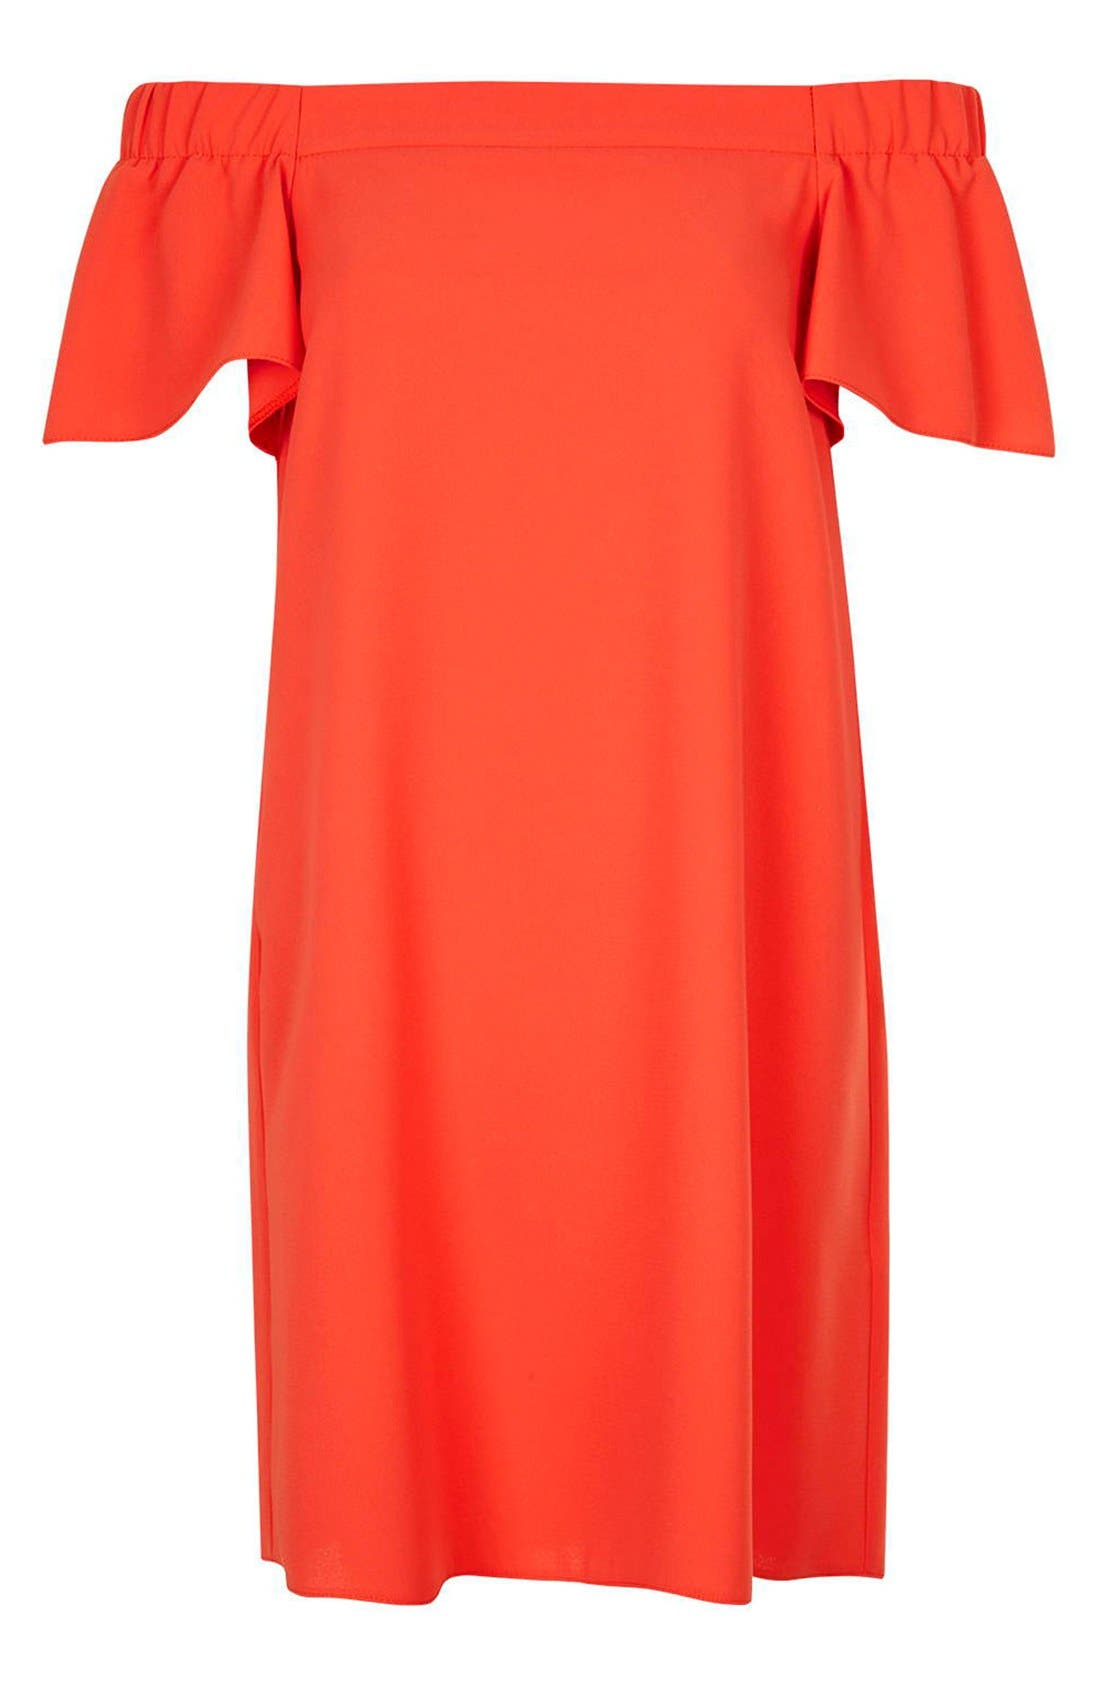 Alternate Image 4  - Topshop Off the Shoulder Trapeze Dress (Regular & Petite)